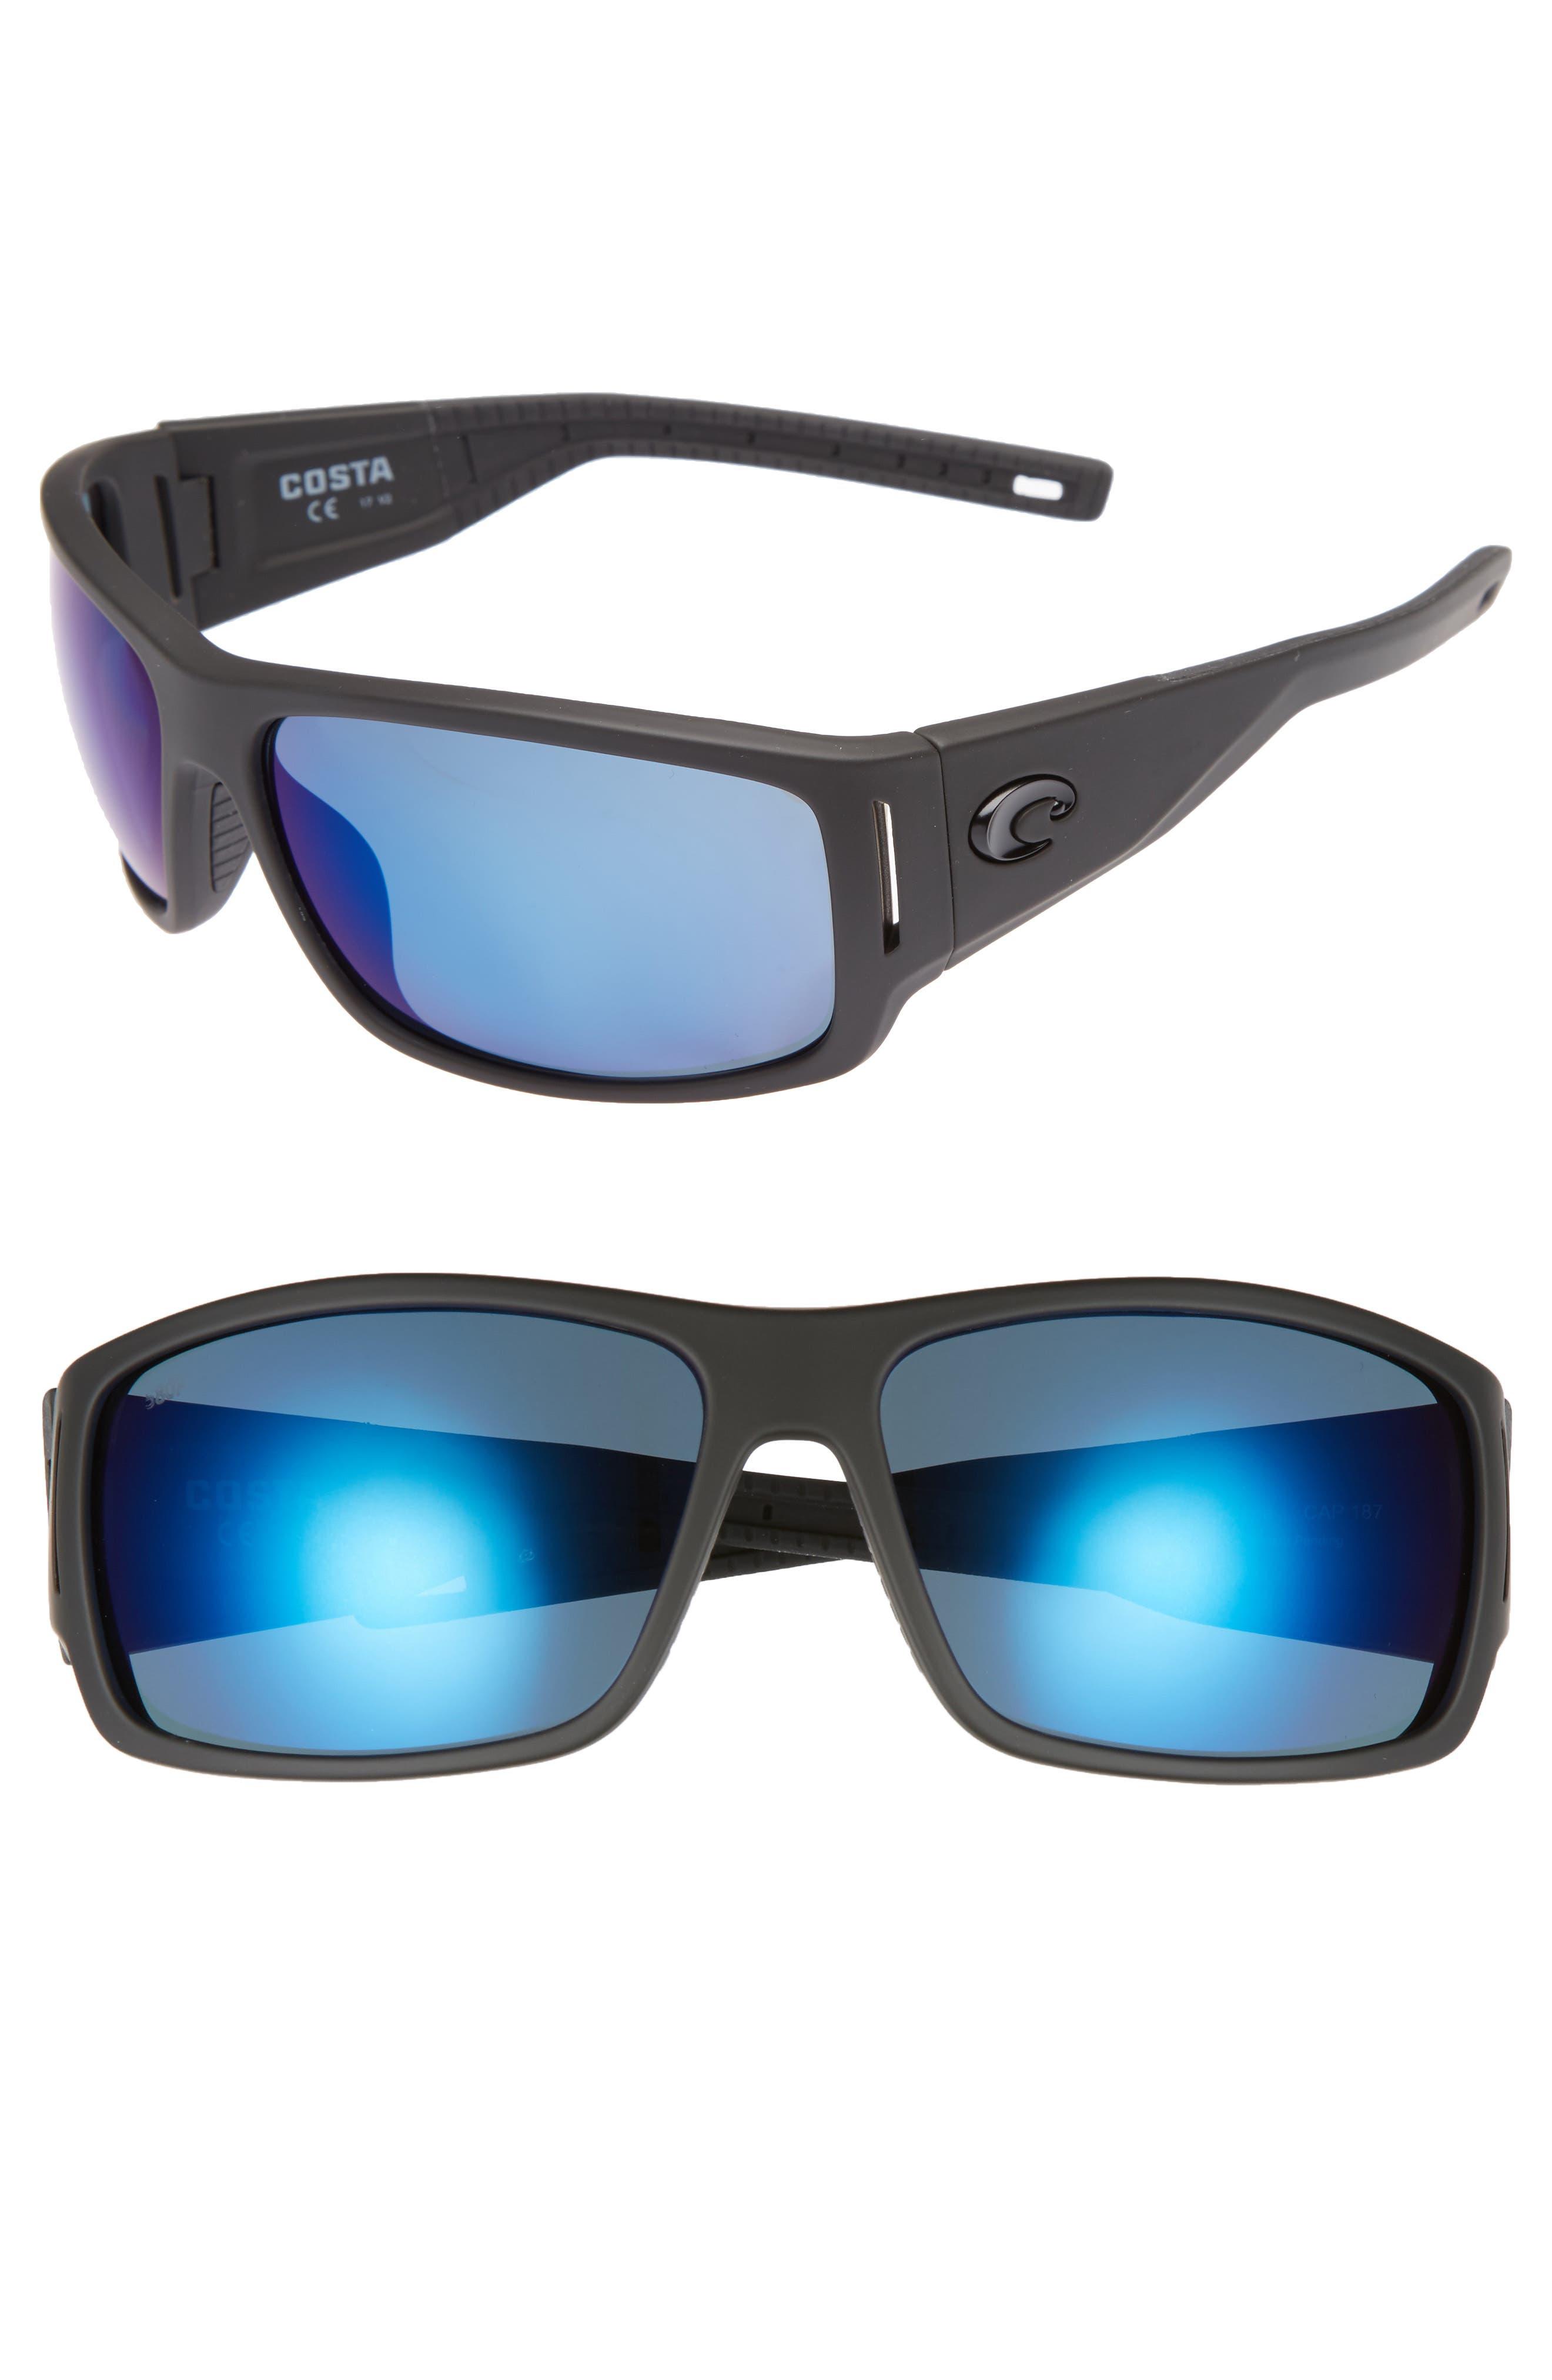 Cape 68mm Polarized Sunglasses,                             Main thumbnail 1, color,                             MATTE BLACK/ BLUE MIRROR